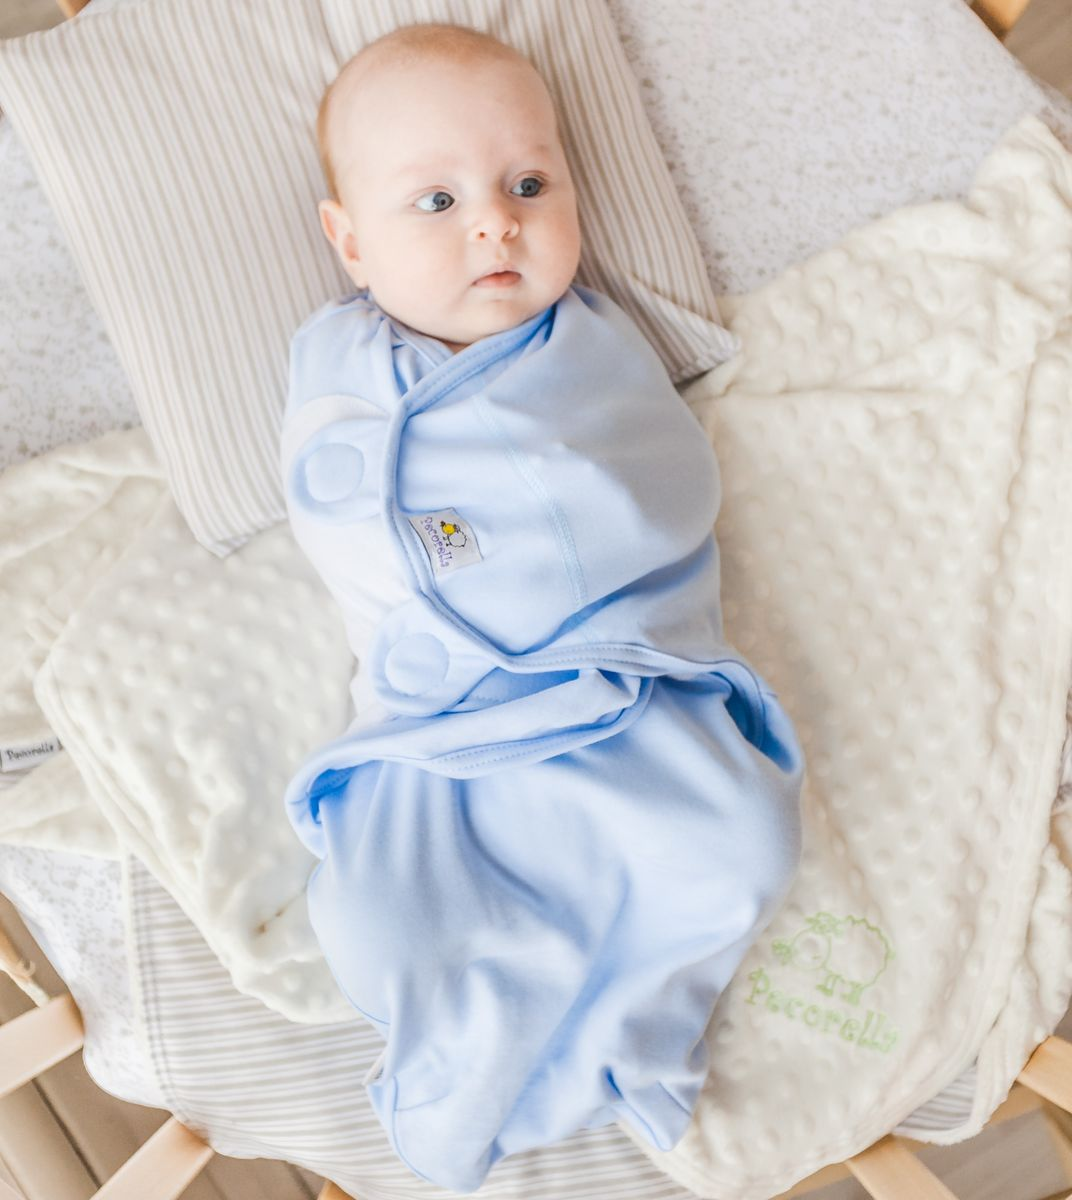 Pecorella Пеленка на липучках SwaddleFun Ocean Blue Размер L 4,5-8,5 кг для крещения пеленка